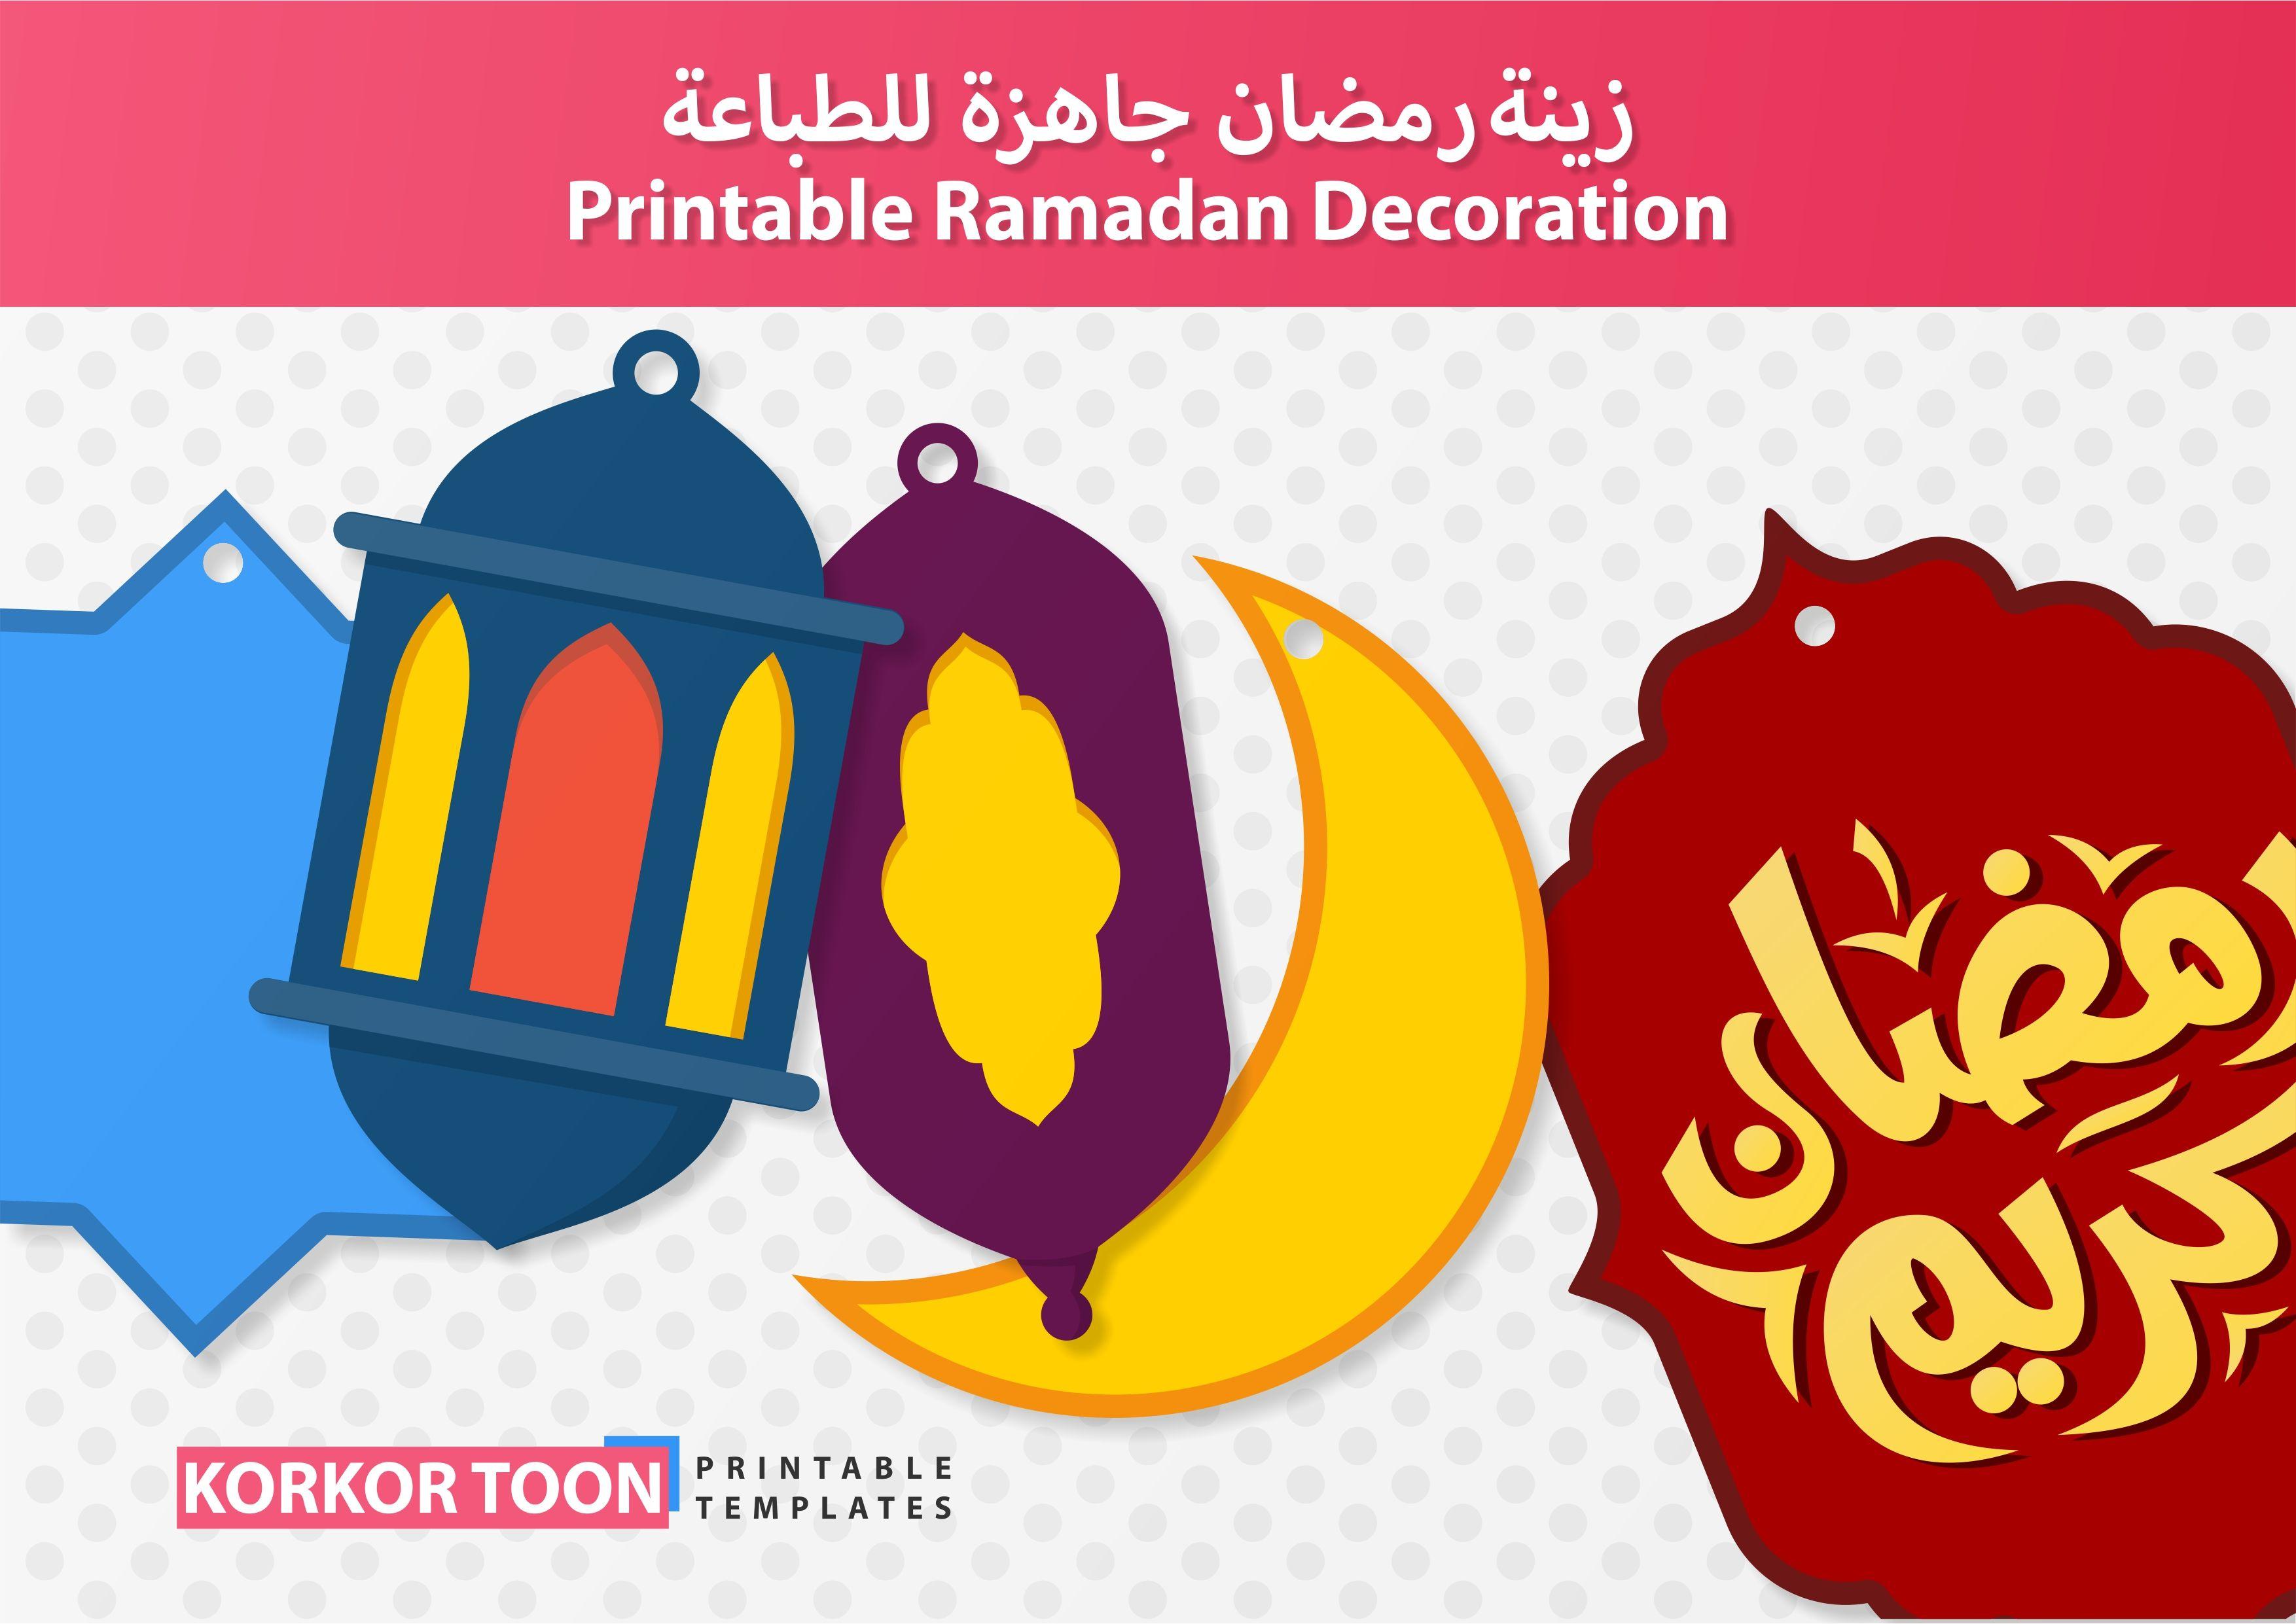 Printable Ramadan Decoration